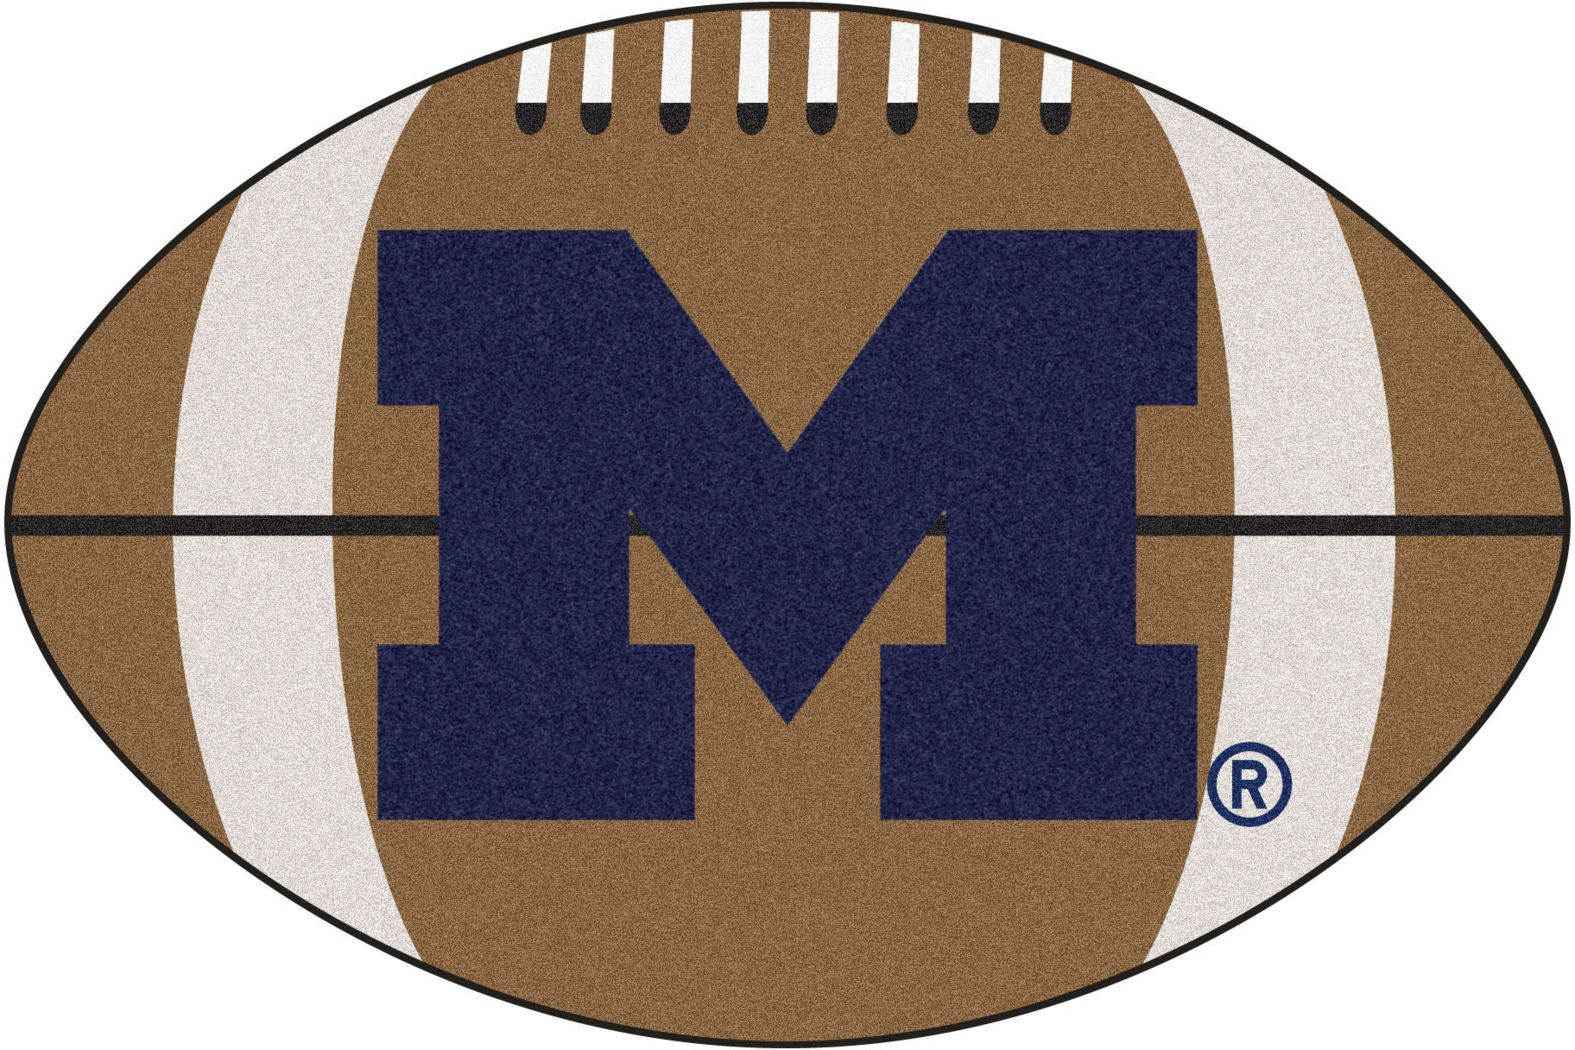 "NCAA Football Mascot University of Michigan 1'6"" x 1'10"" Rug"